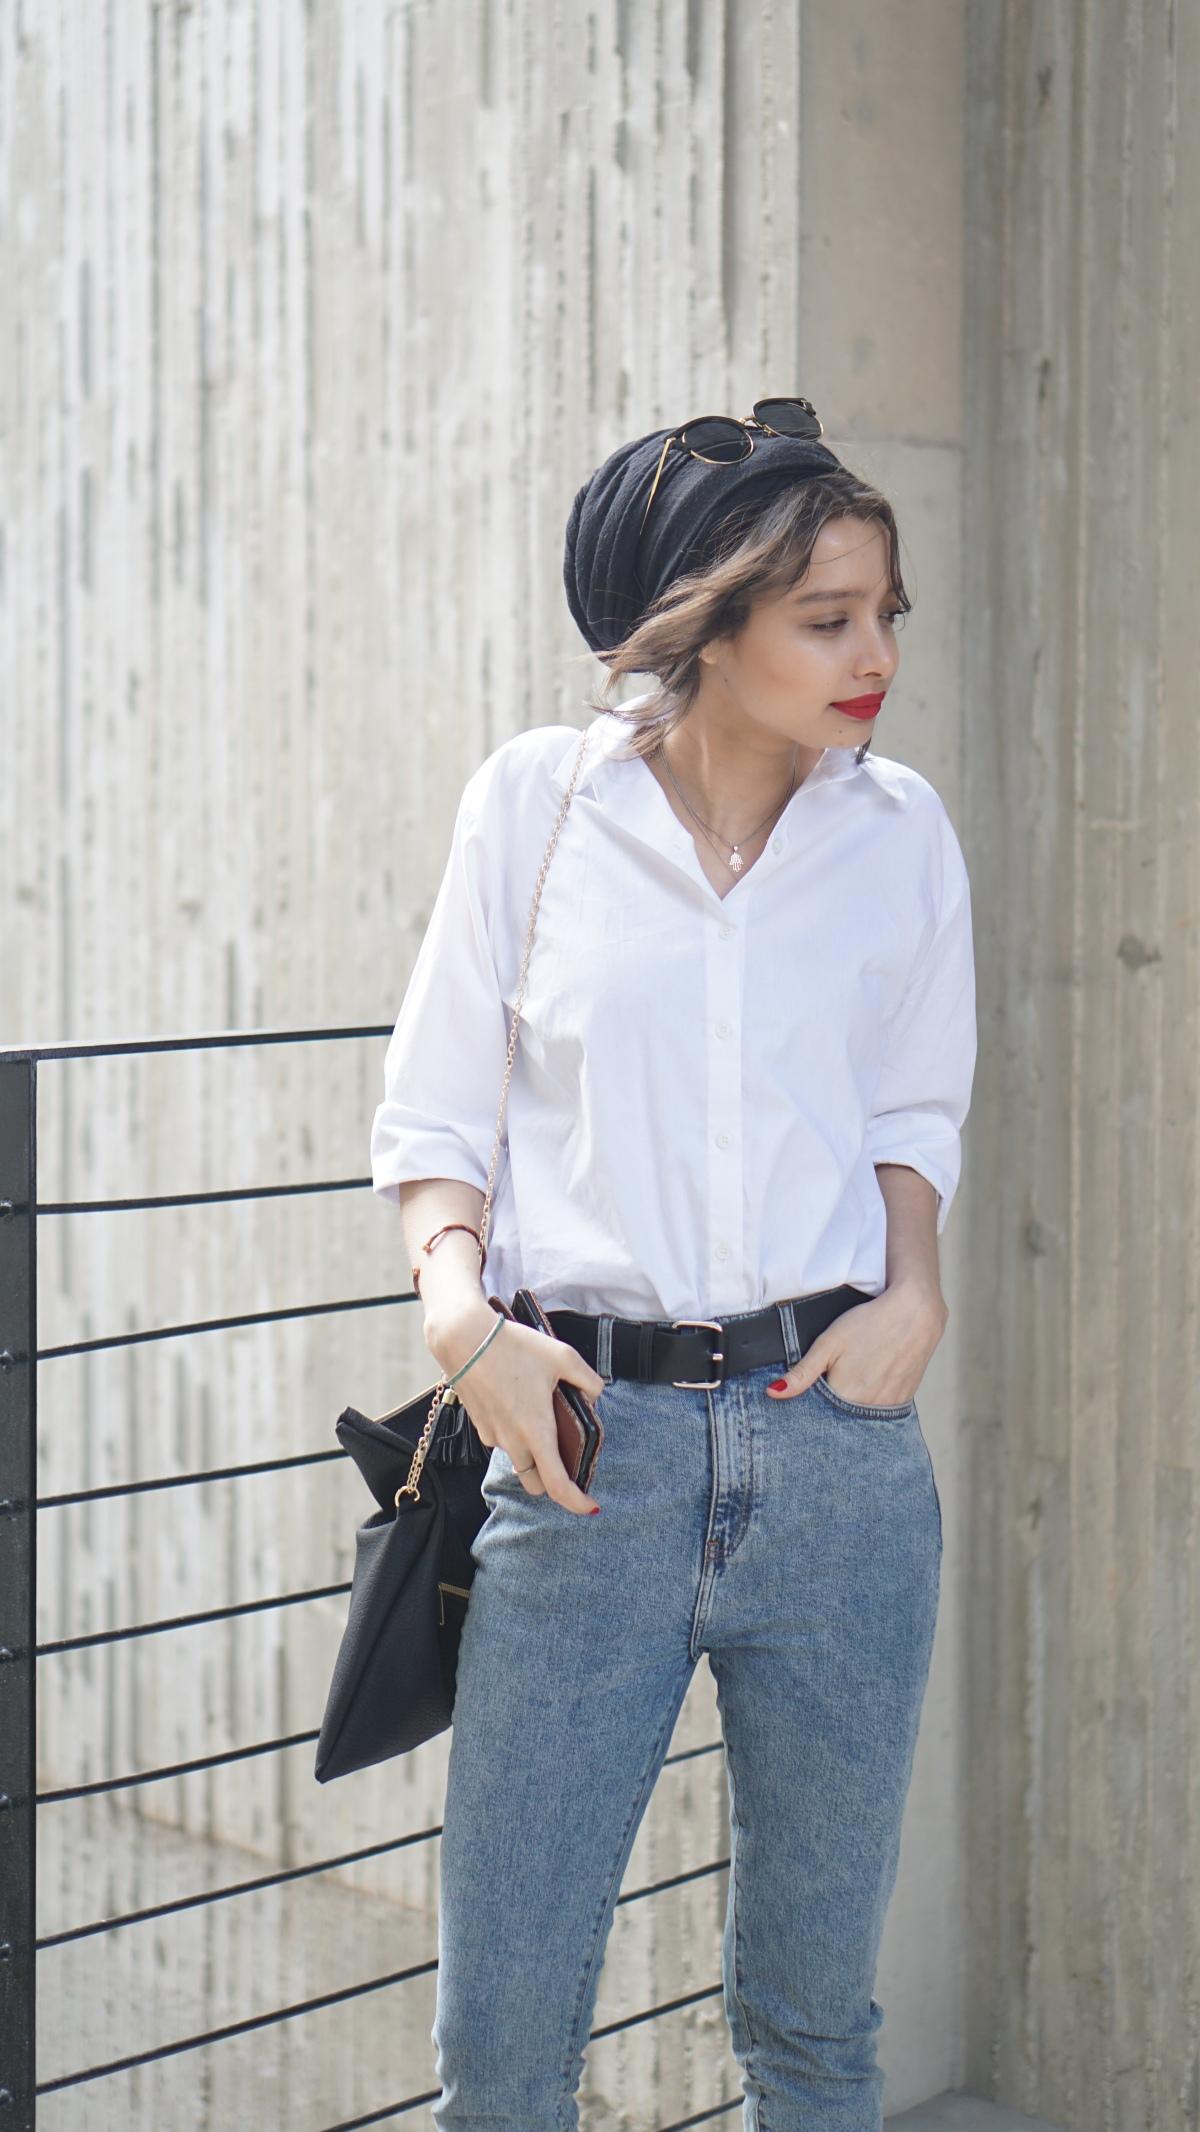 hijab_woman_waering_capsule_wardobe_items_white_shirt_blue_jeans